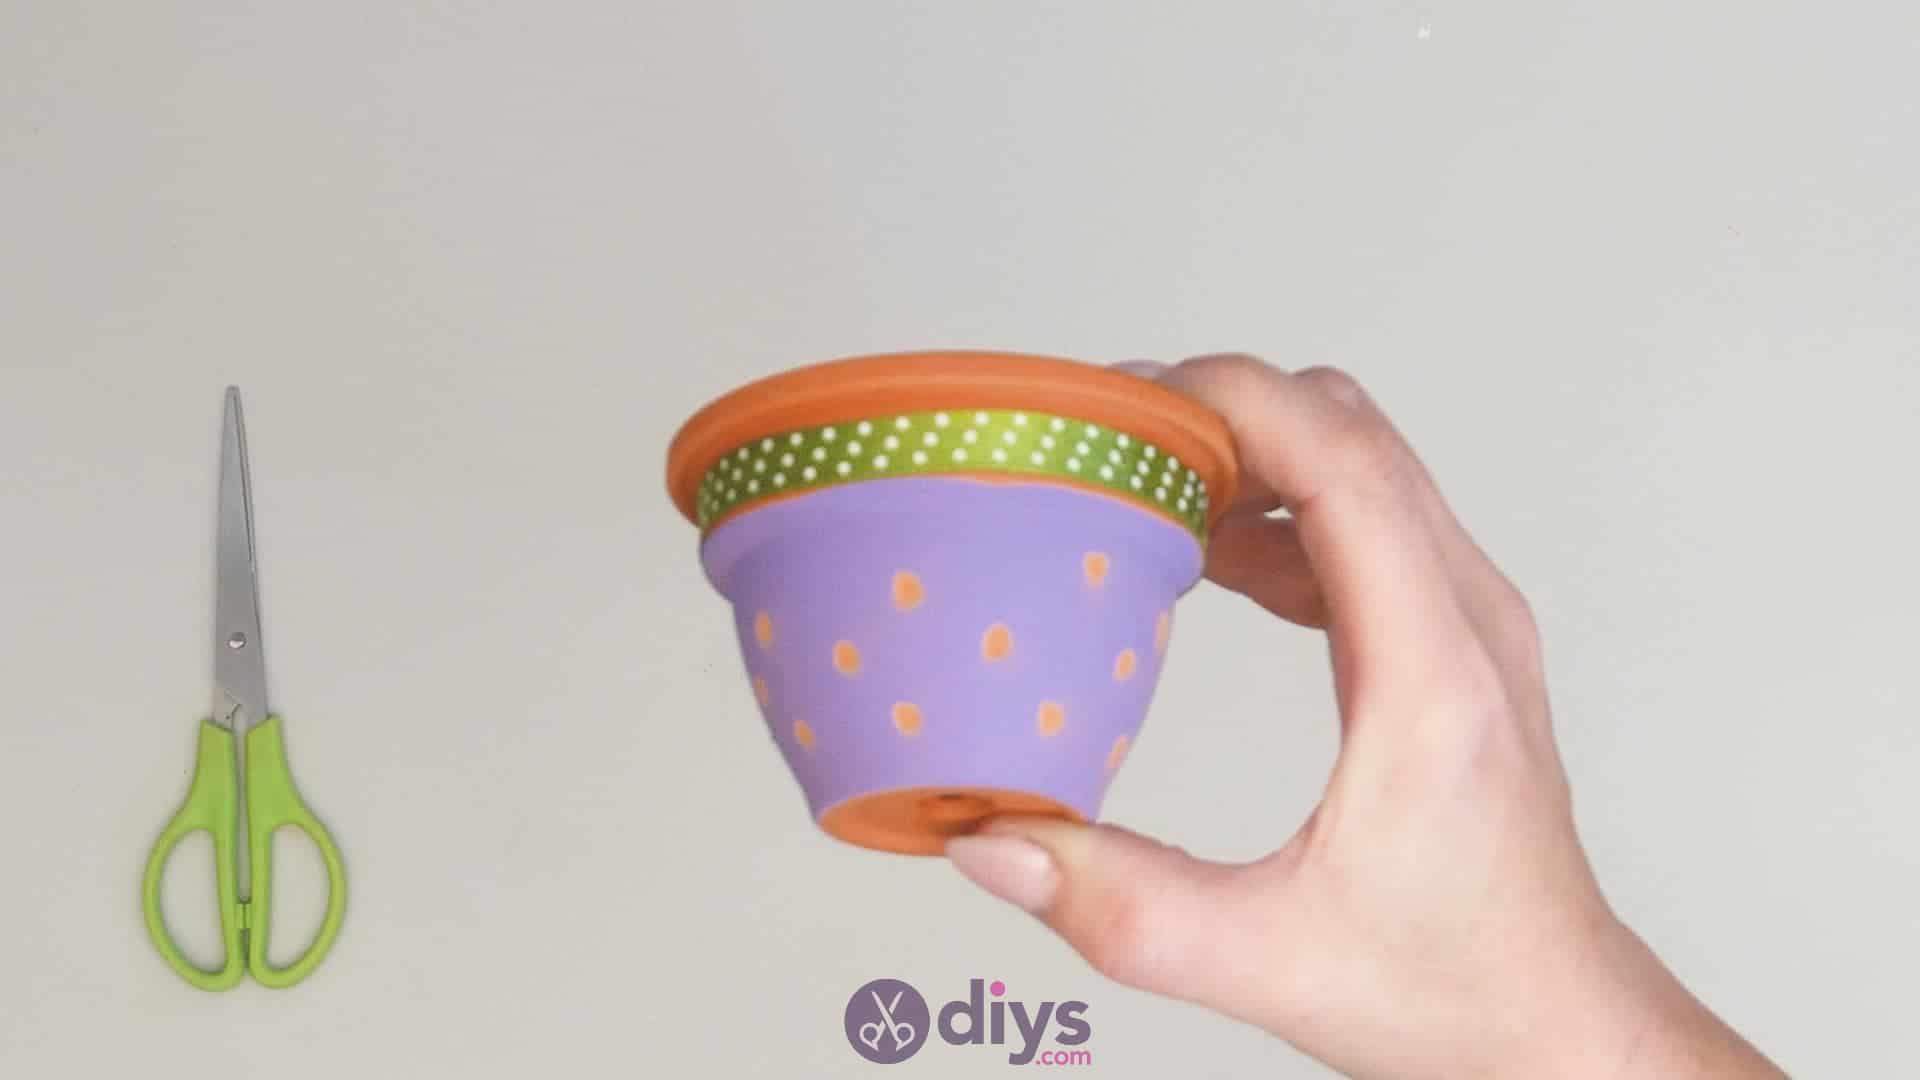 Diy colourful flower pot step 3j